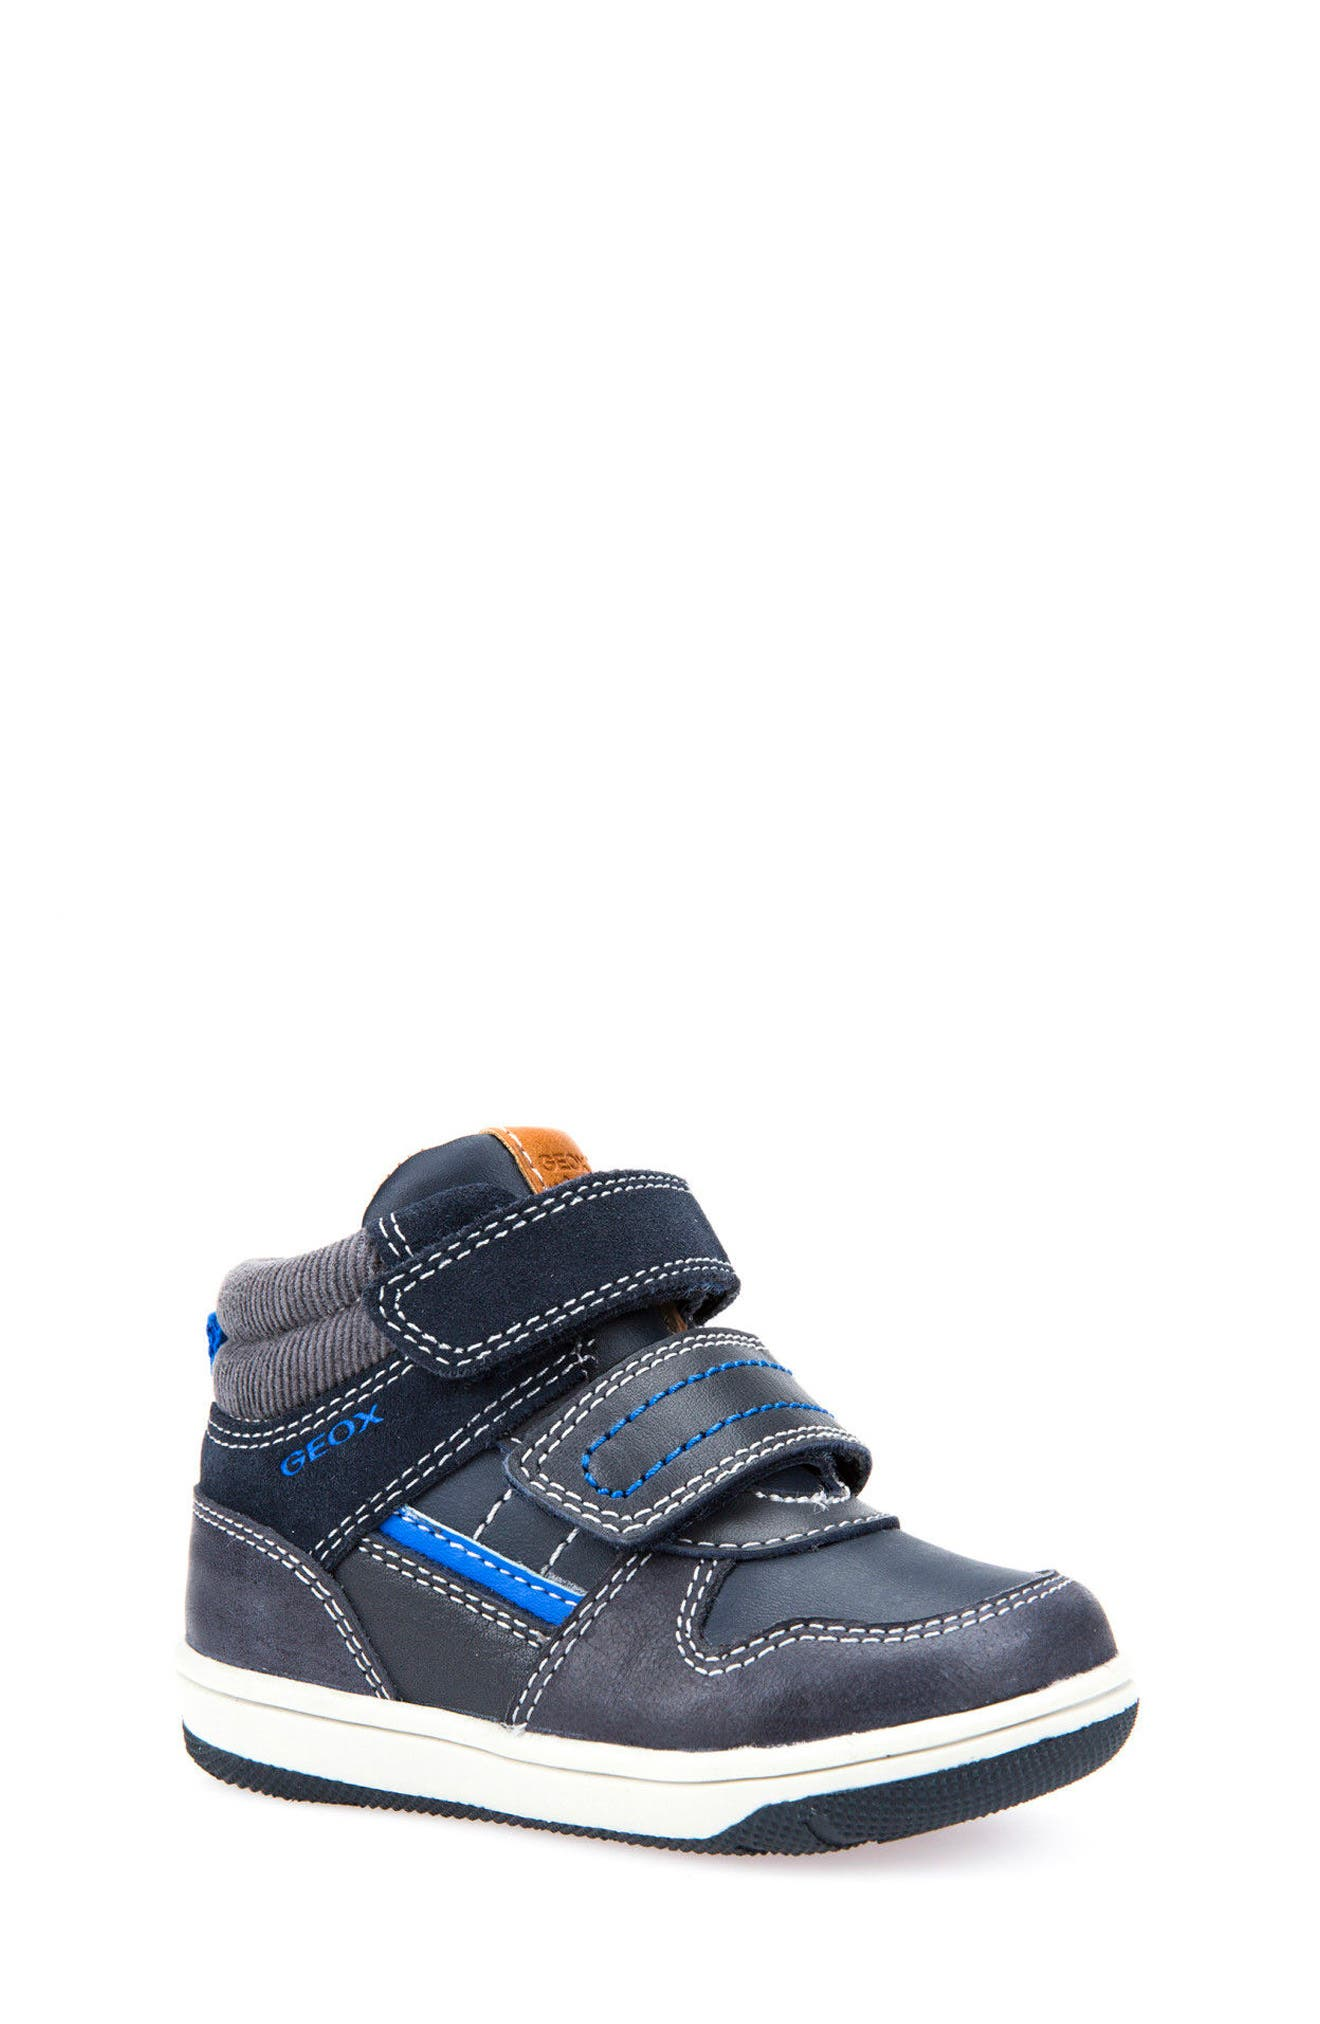 New Flick Mid Top Sneaker,                             Main thumbnail 1, color,                             002